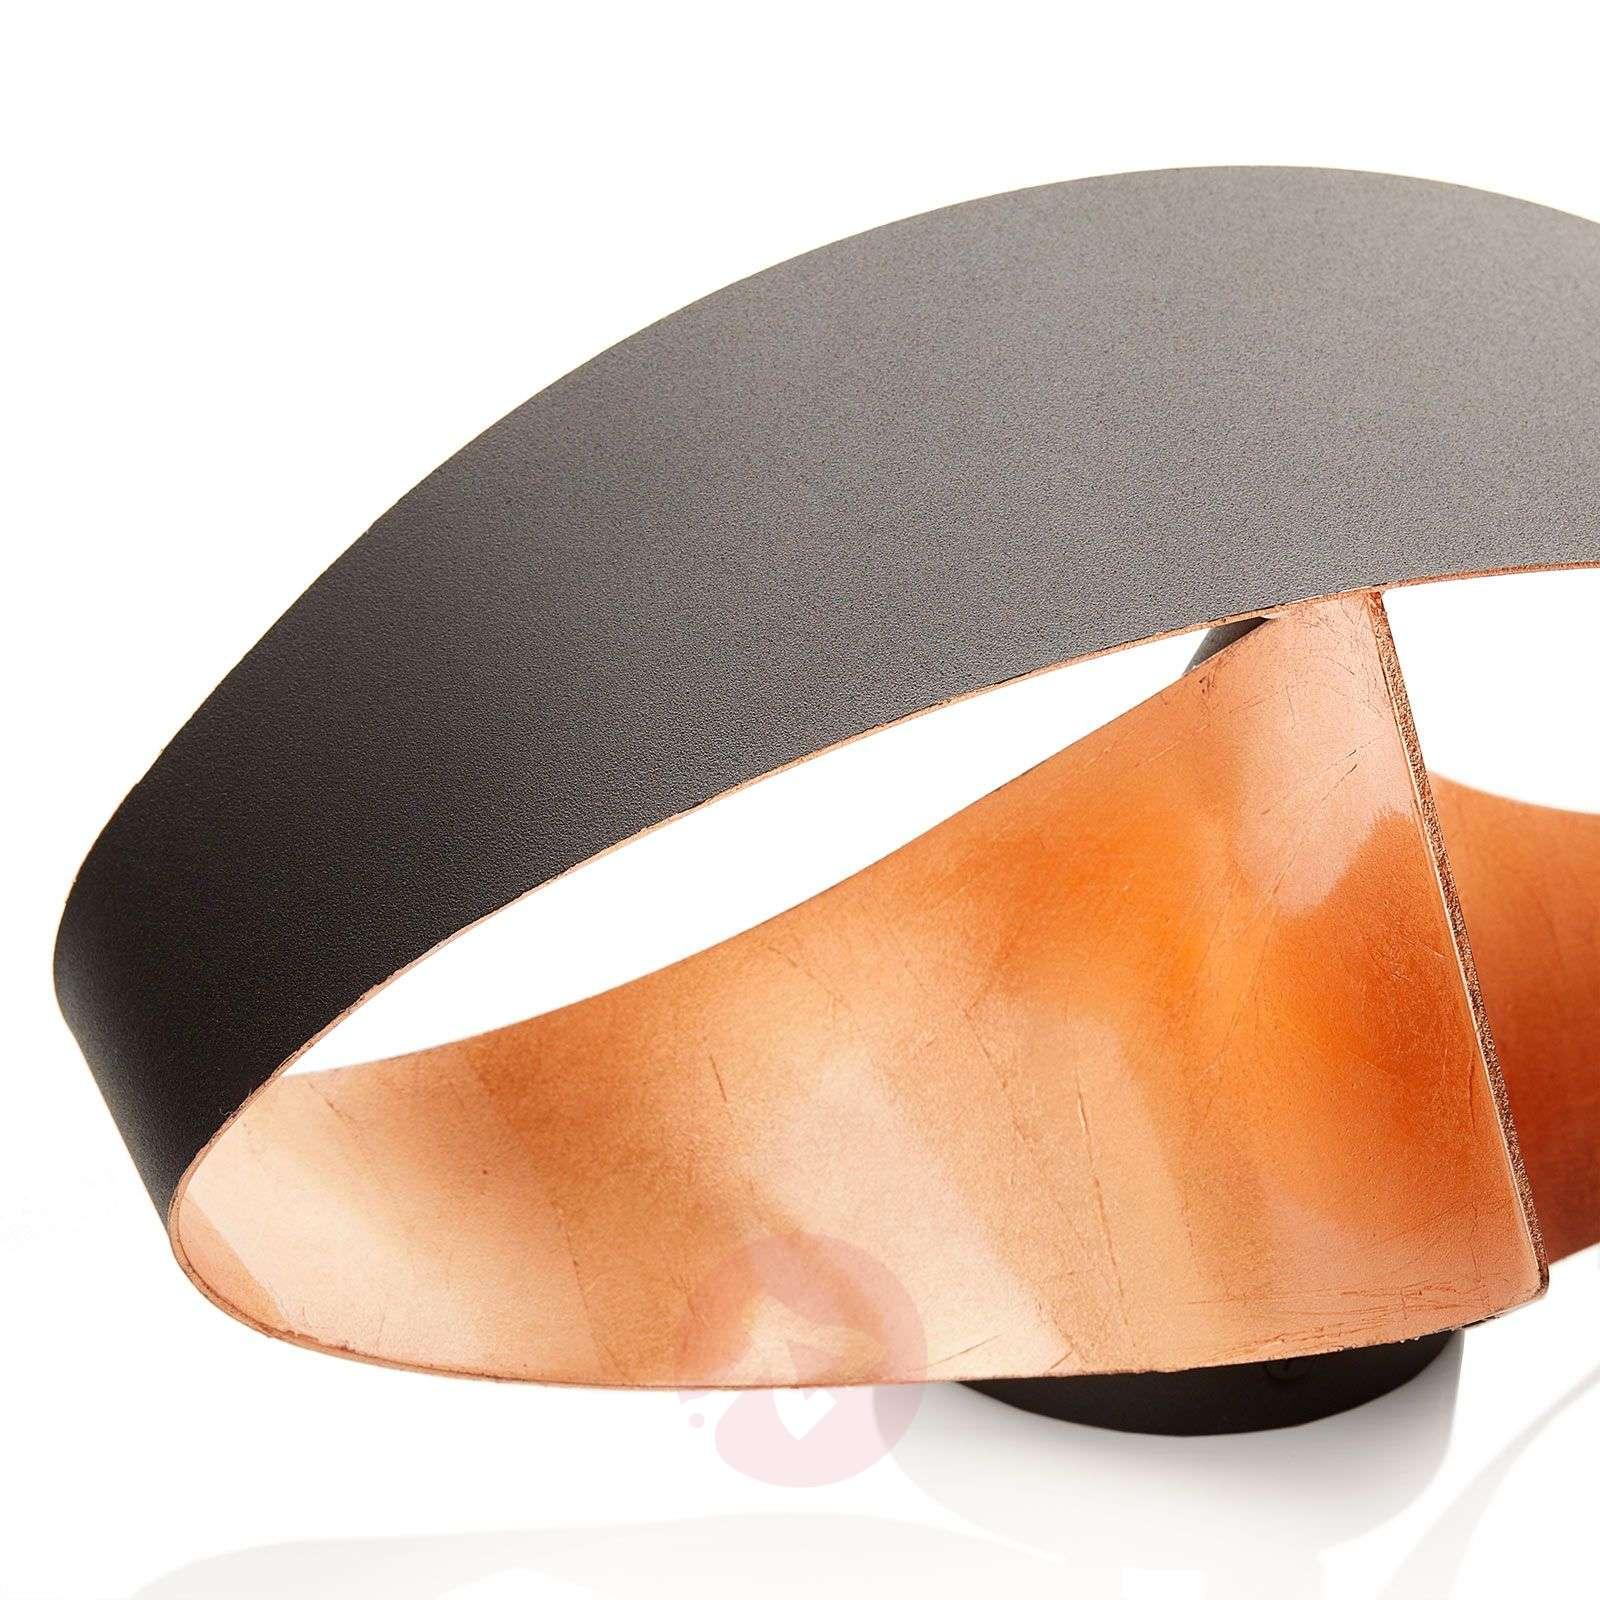 Copper-coloured inside LED wall light Scudo-8525792-01